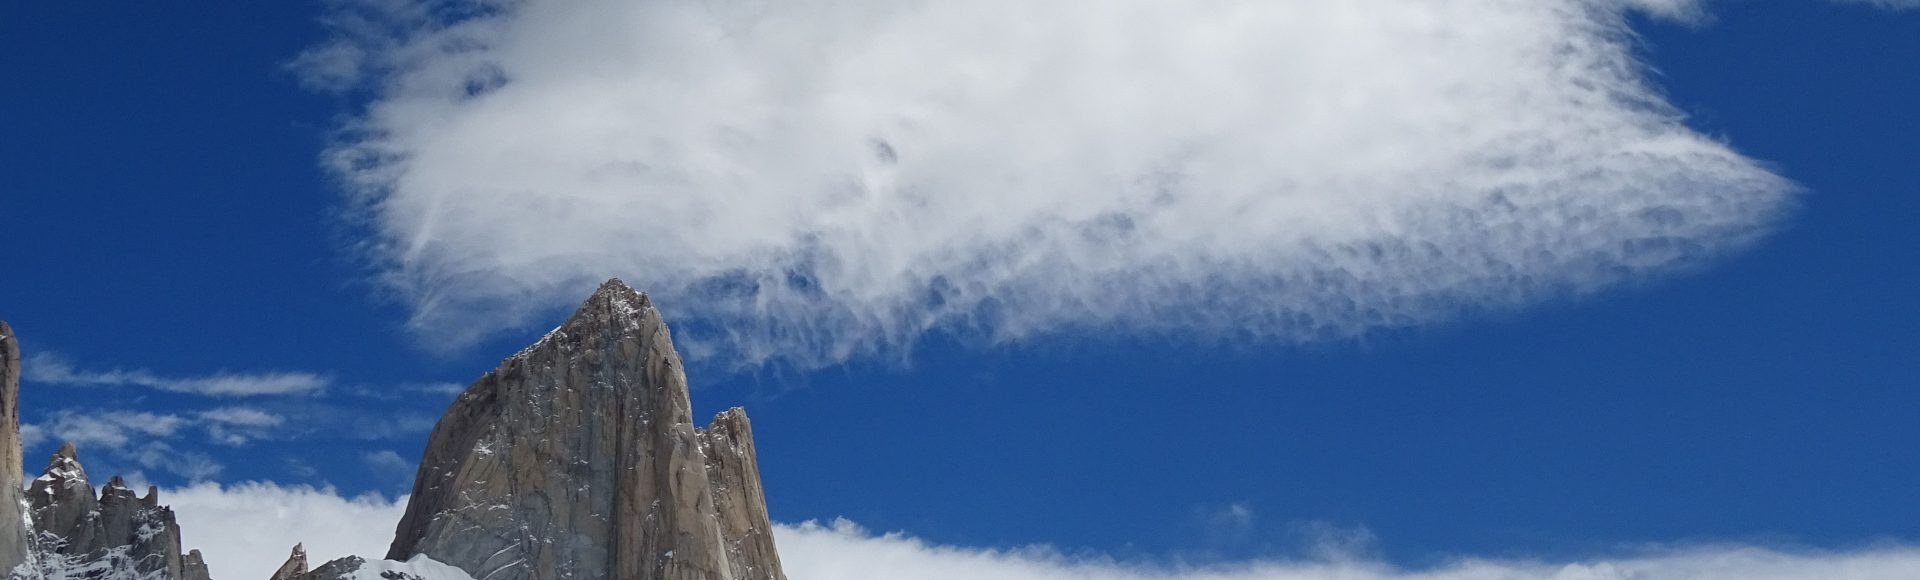 Incursion en Patagonie argentine